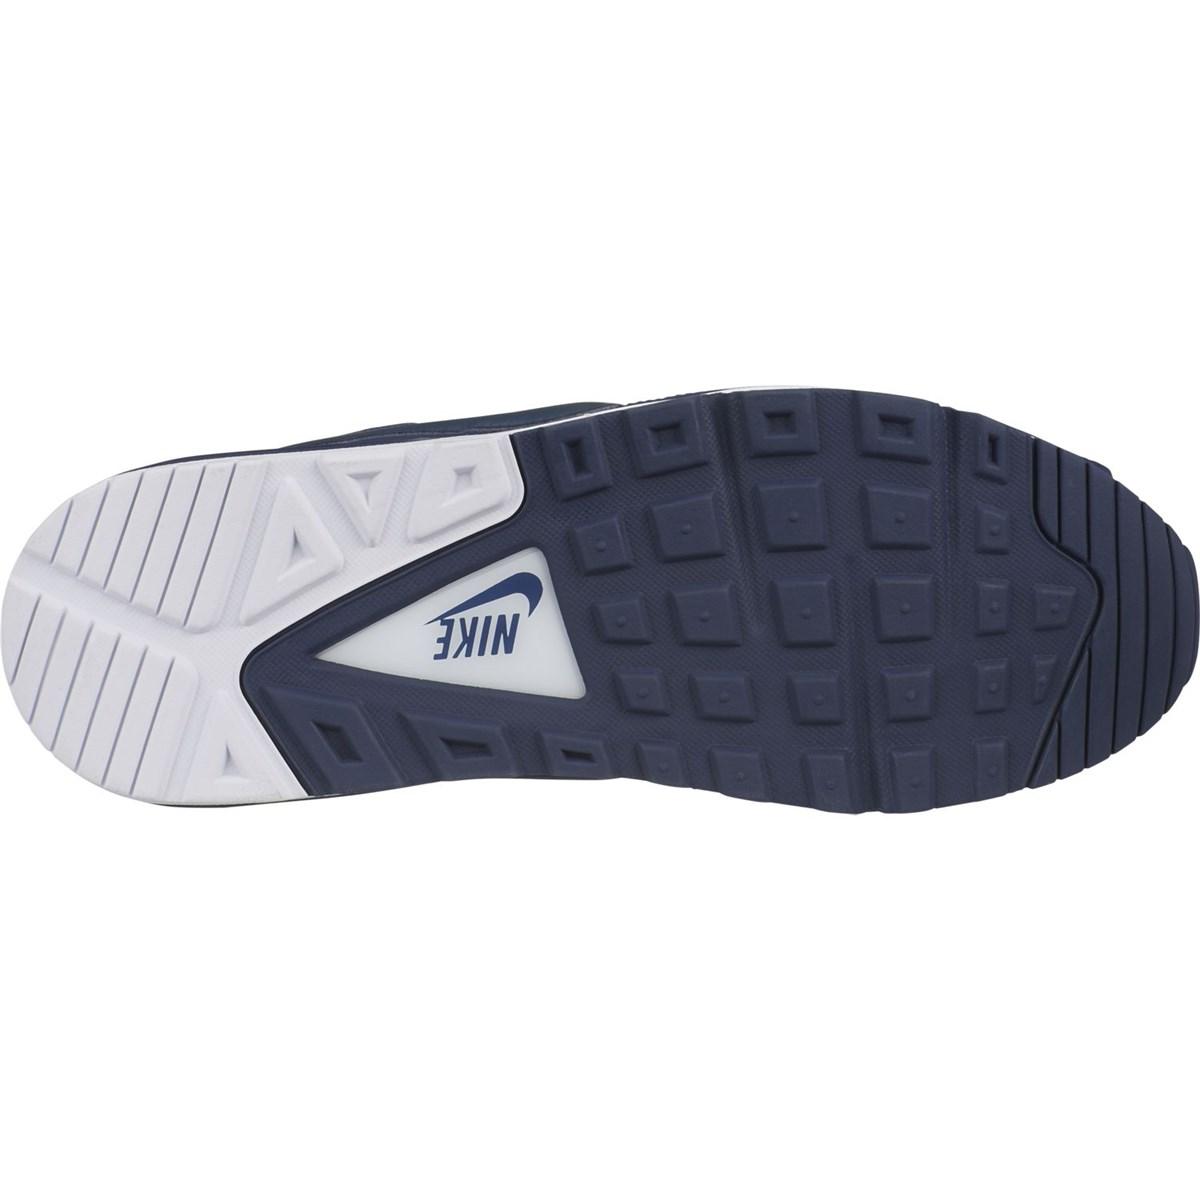 Air Max Command Erkek Gri Ayakkabı